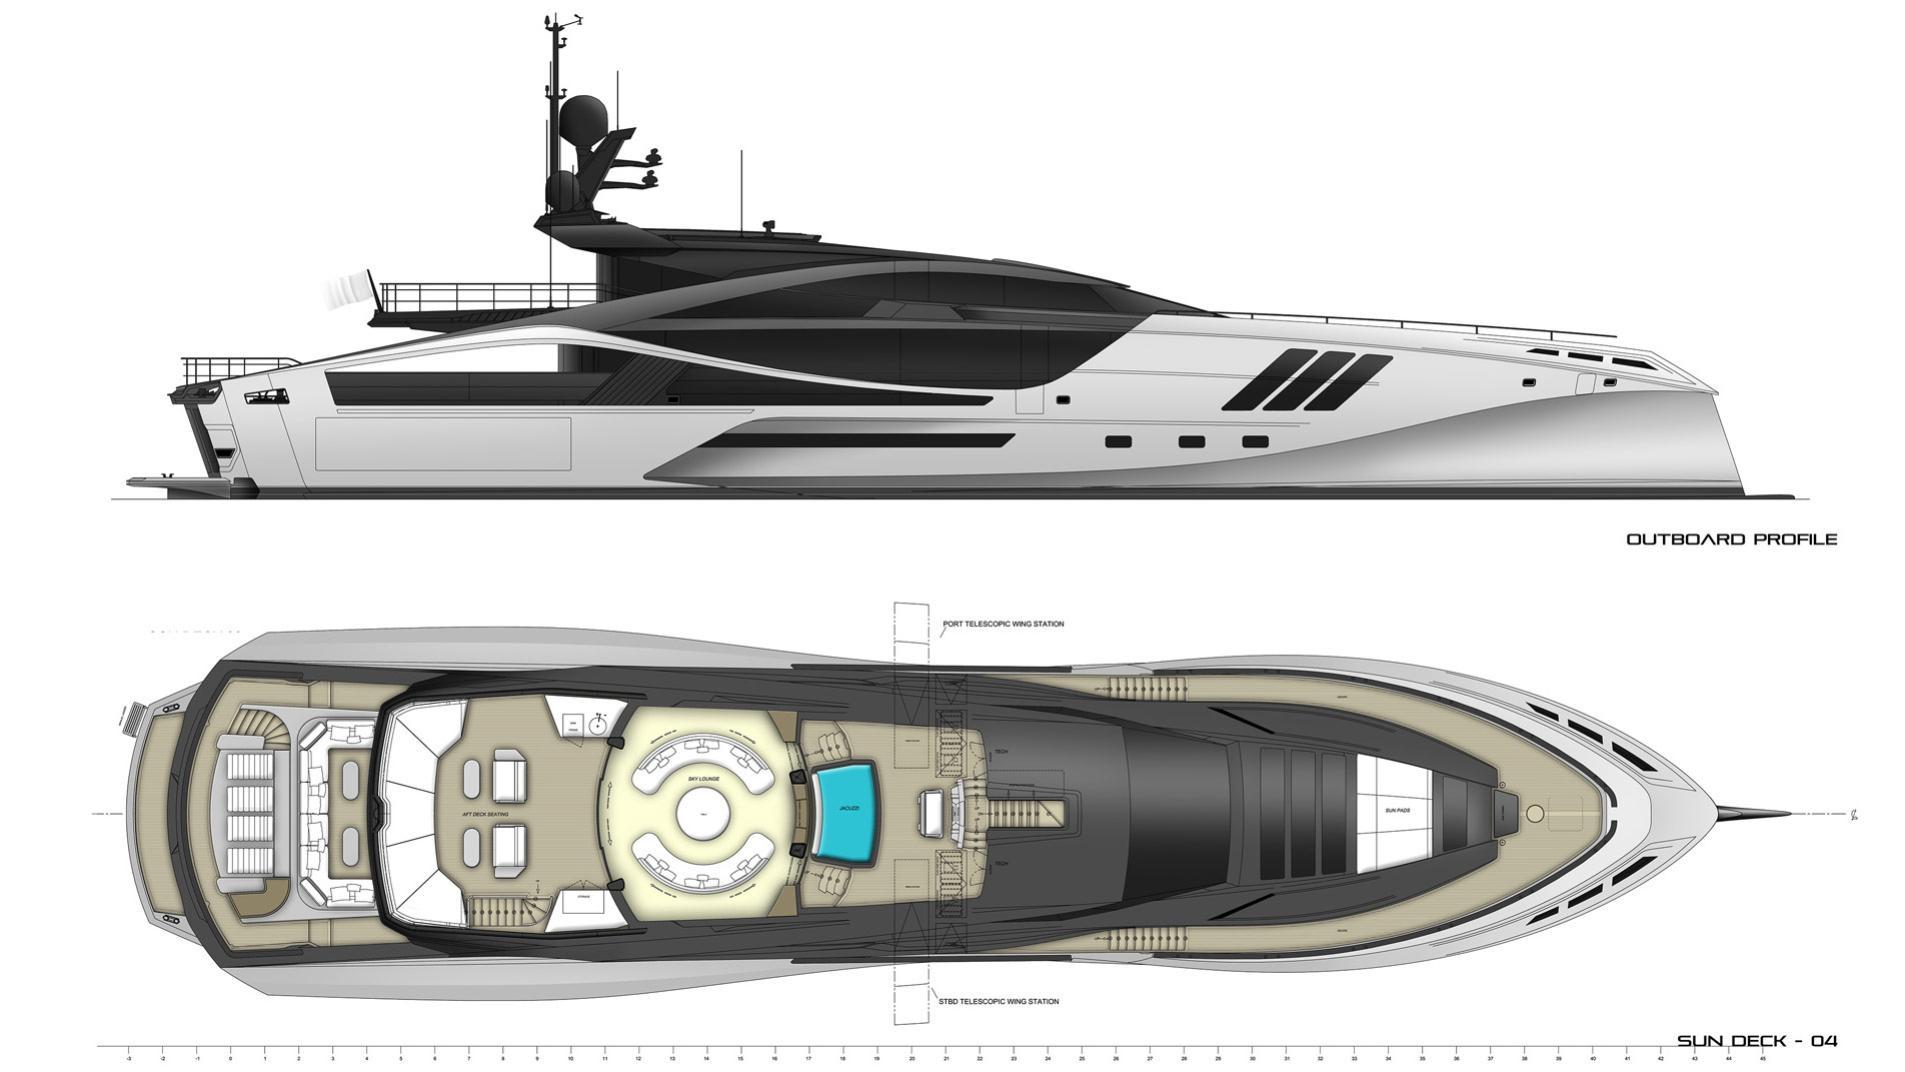 supersport-48-2-motor-yacht-palmer-johnson-2016-49m-plans